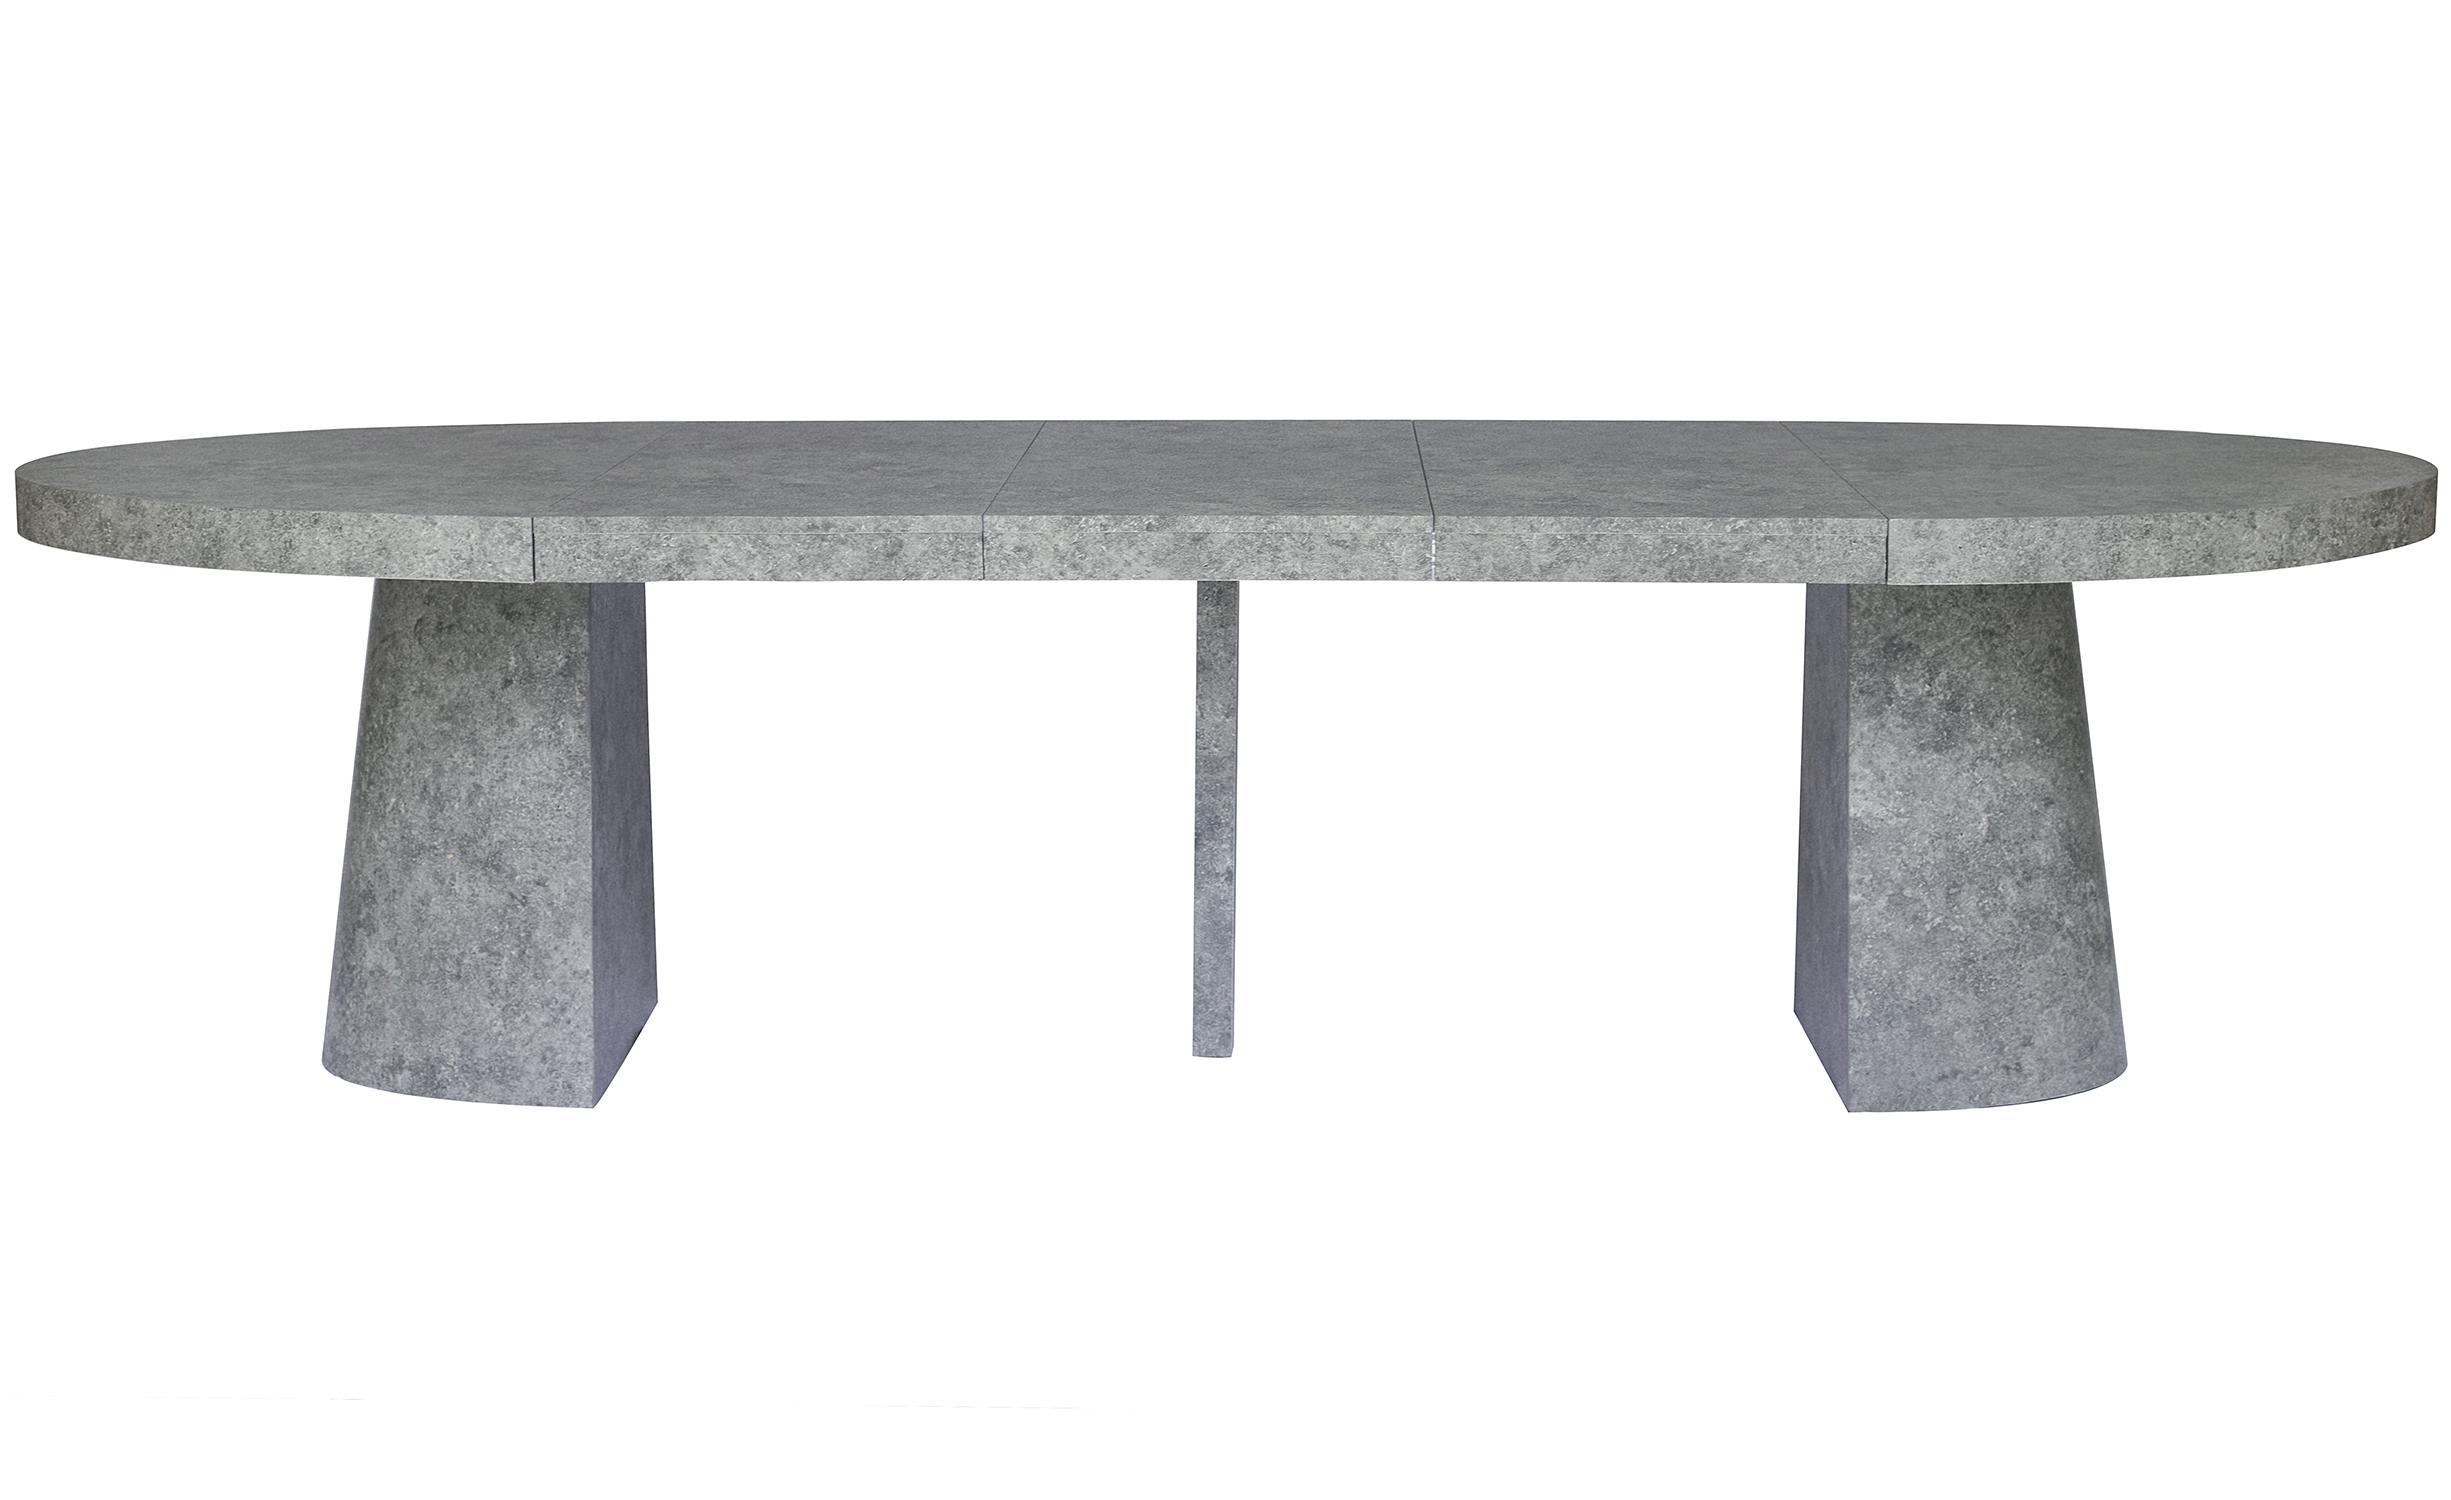 Ovale uitschuifbare tafel Oluze Beton Effect